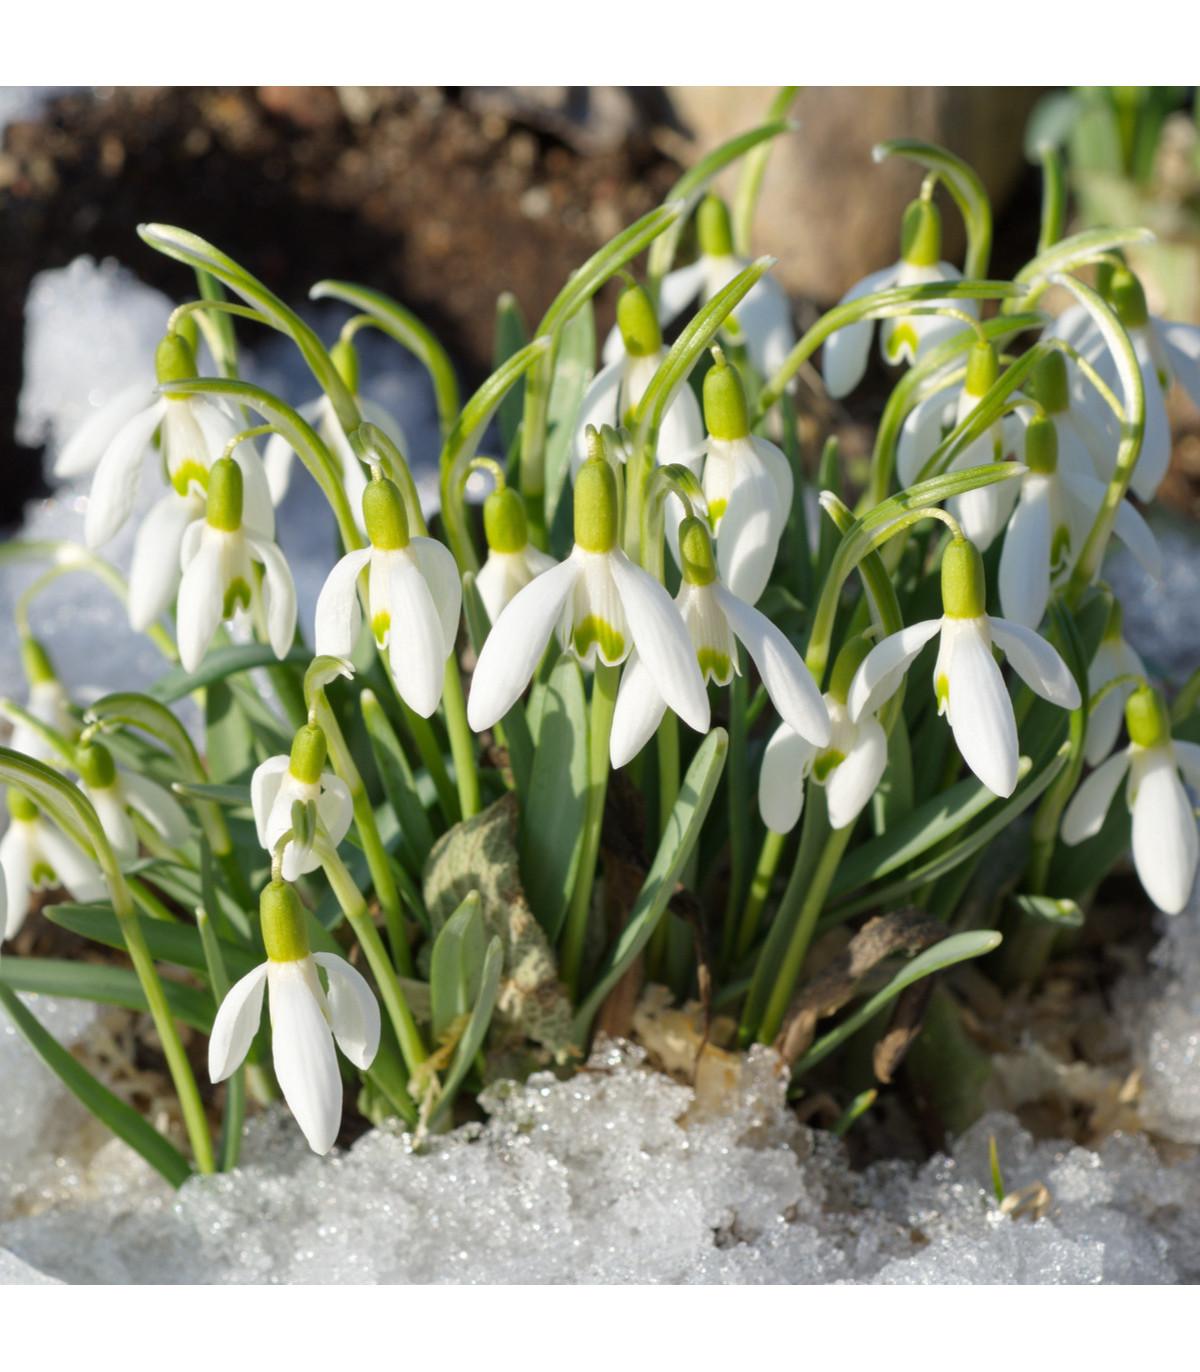 Snežienka Woronova - Galanthus woronovii - cibuľoviny -3 ks